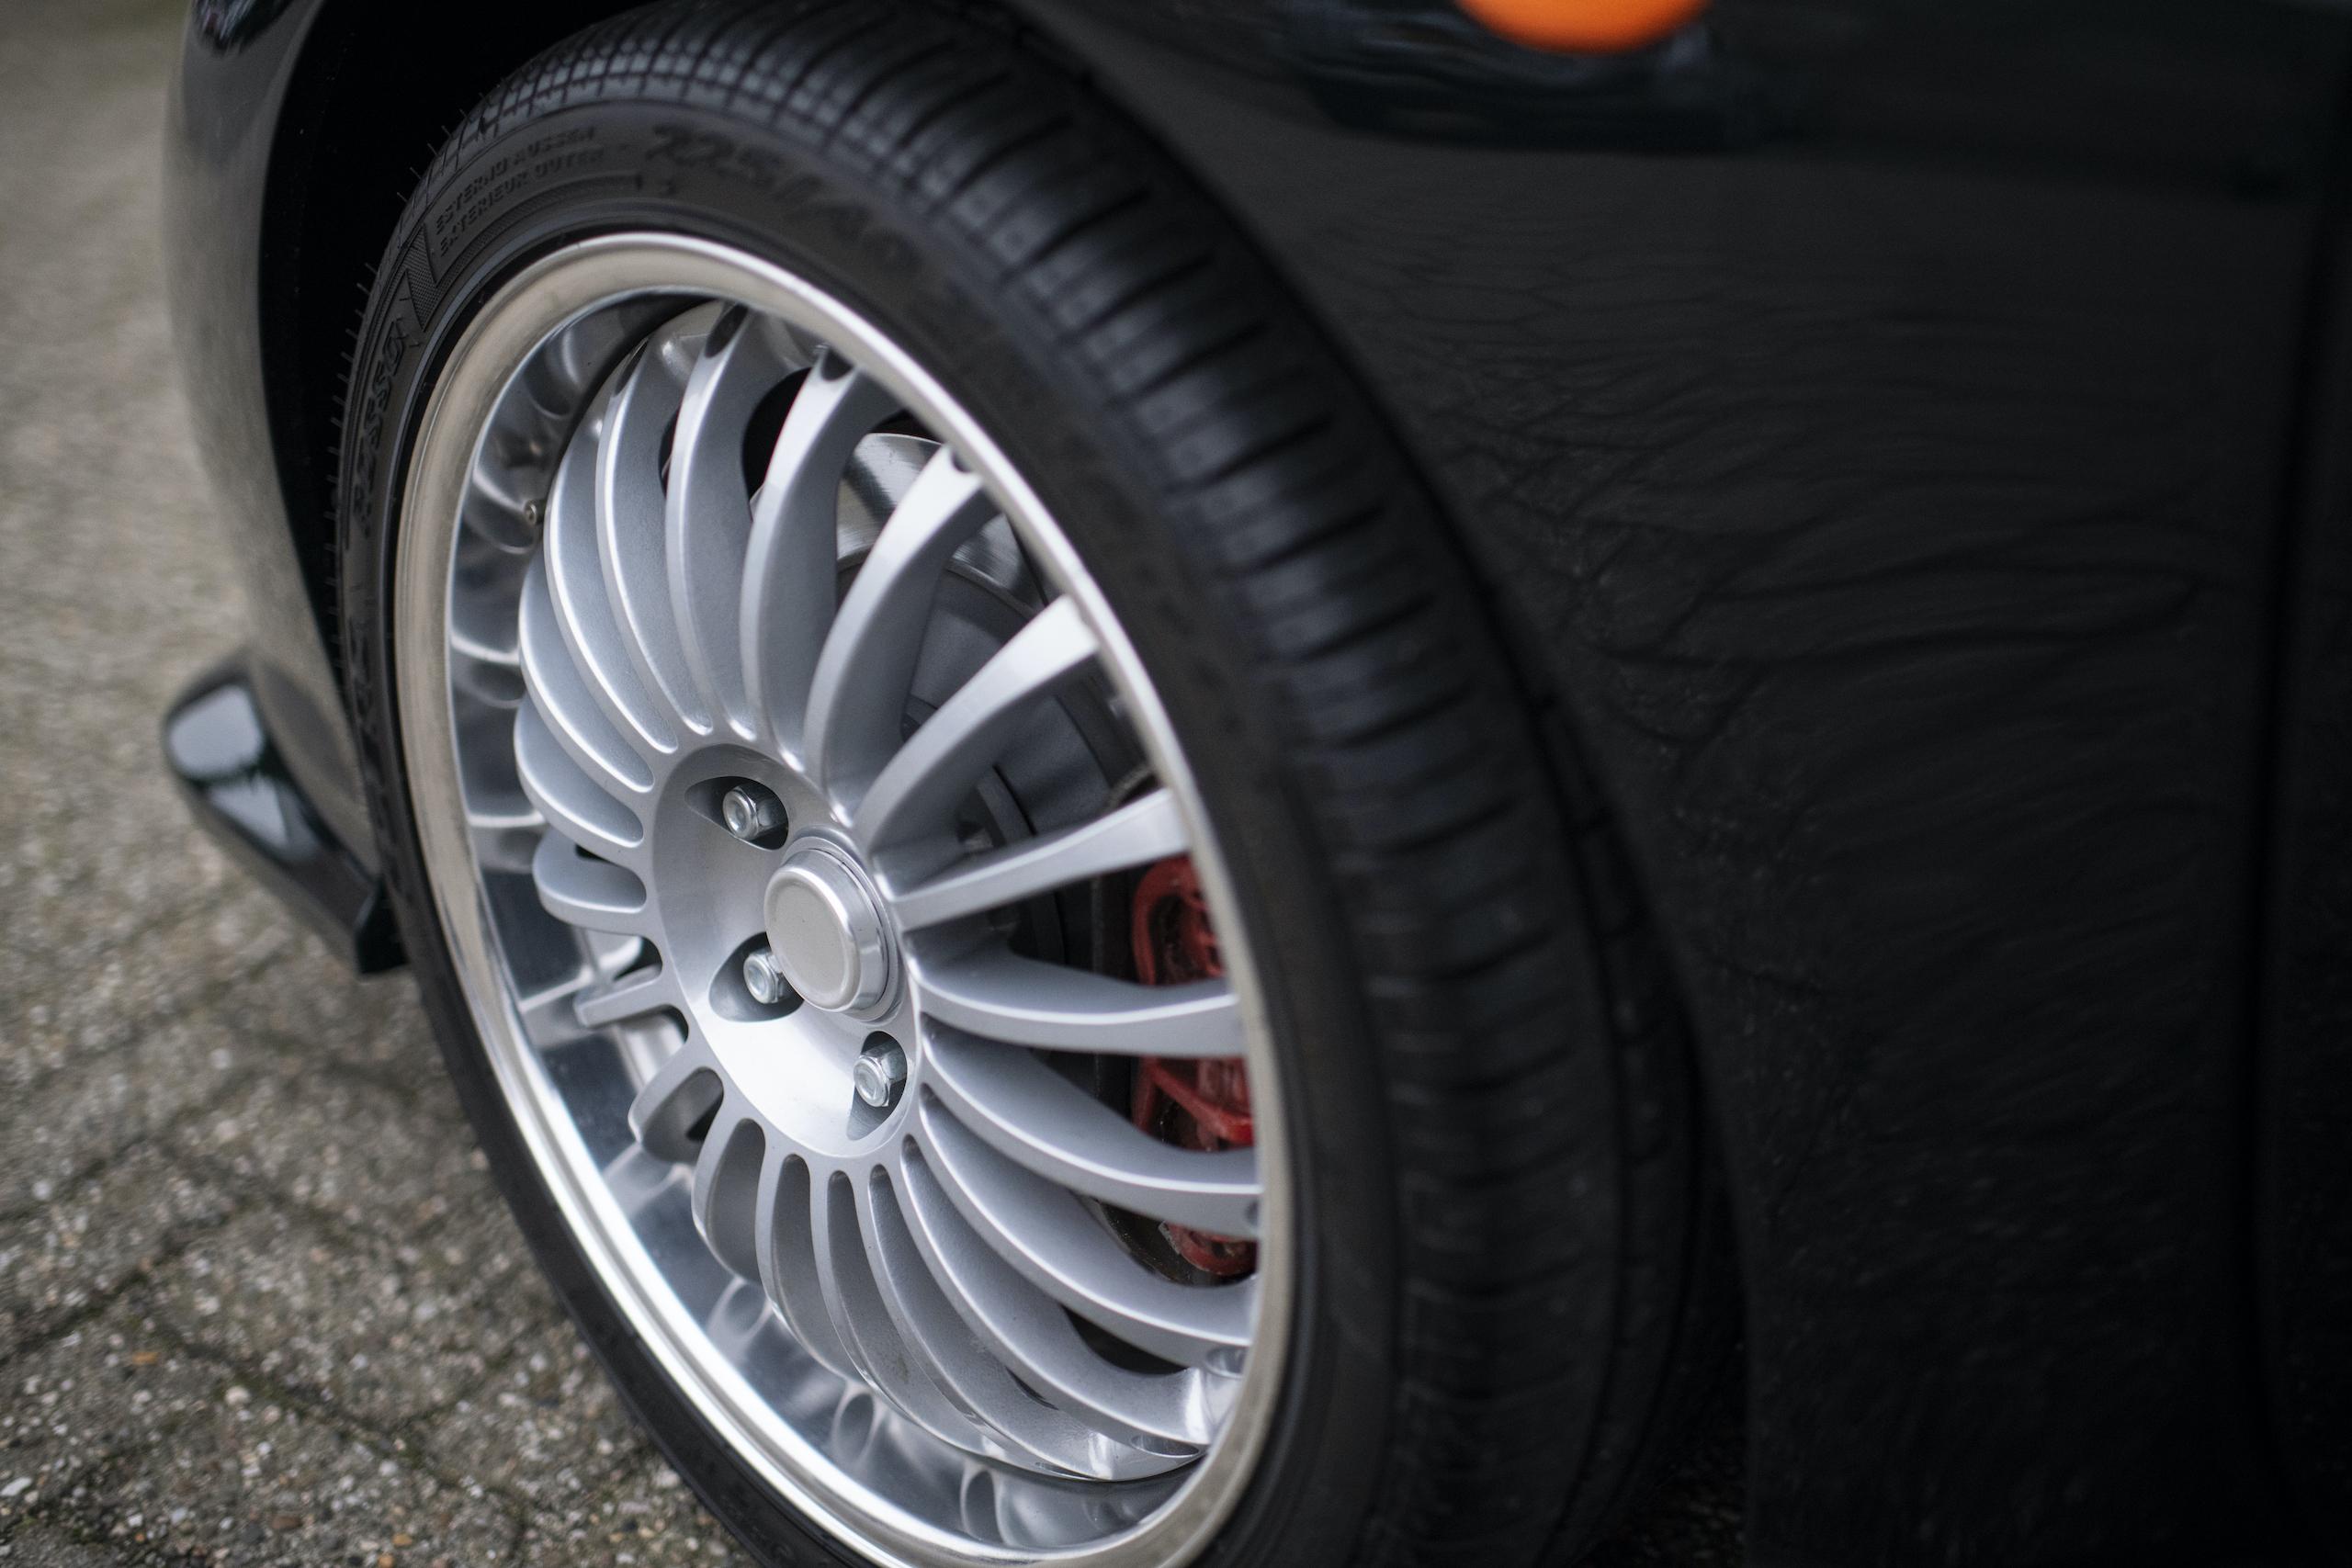 1997 Ascari Ecosse wheel detail